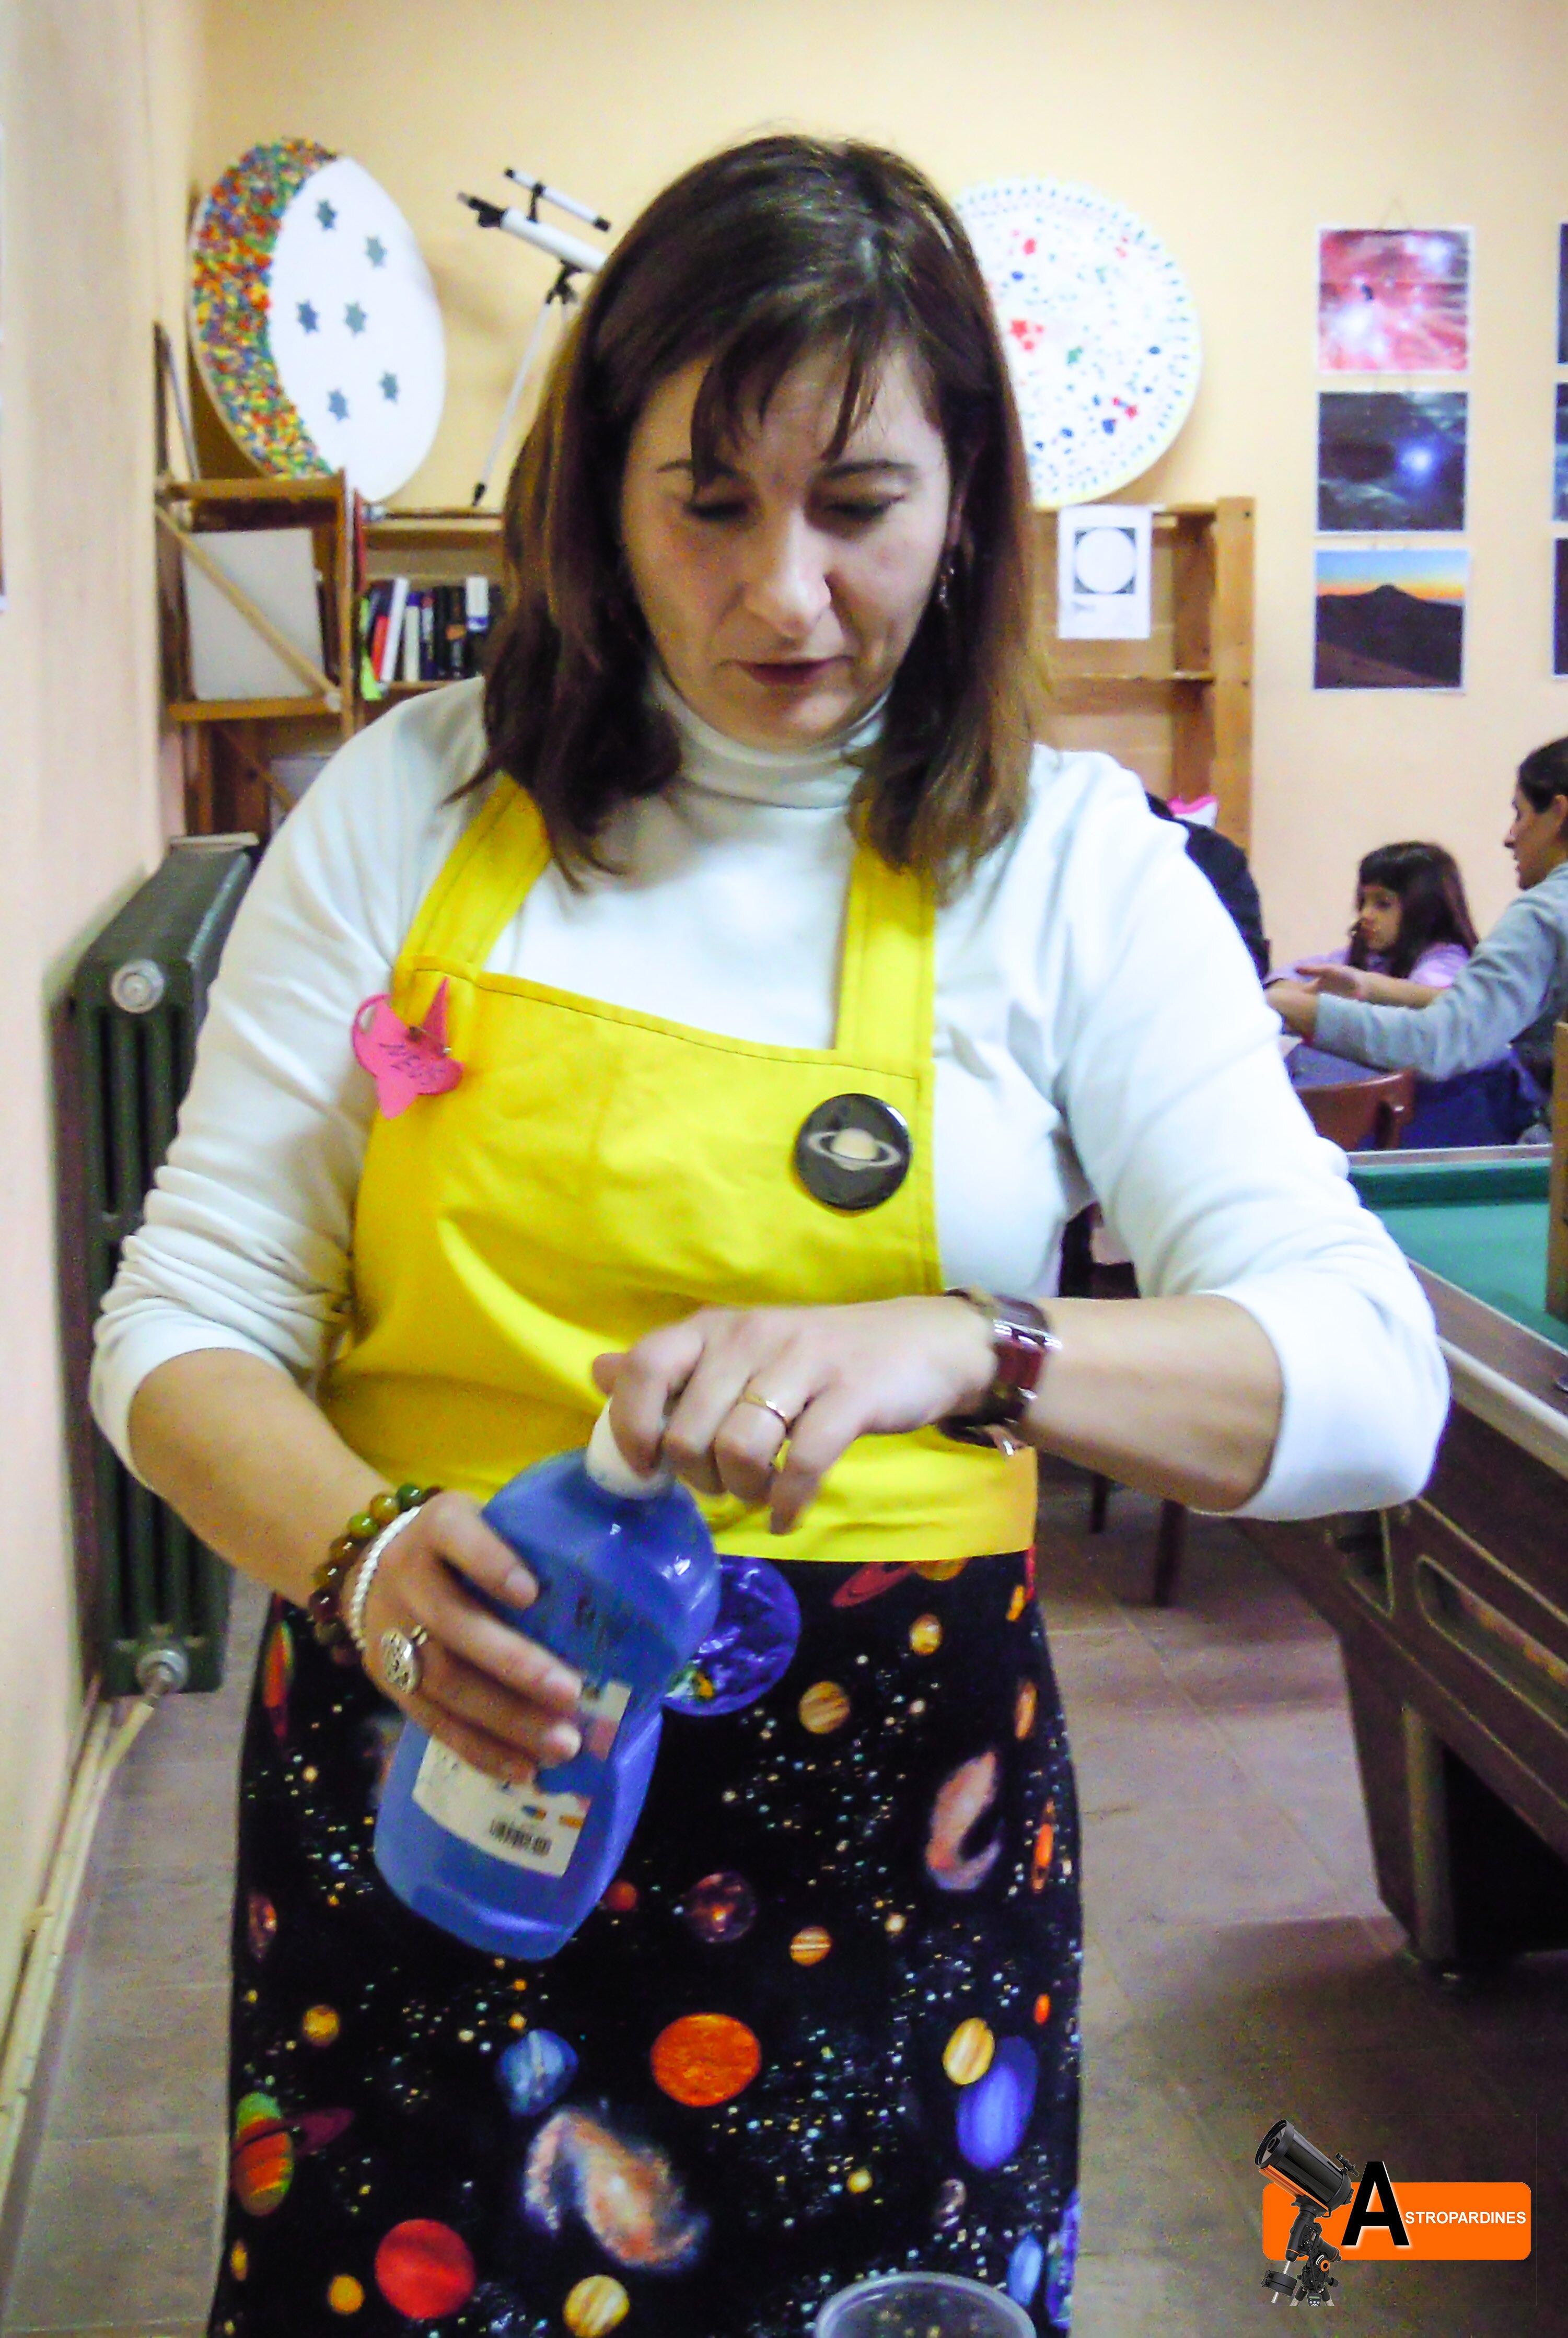 TEI 13-02-2016 - Al febrer, astronauta sere -   Ribes de Freser  - Astropardines (15)